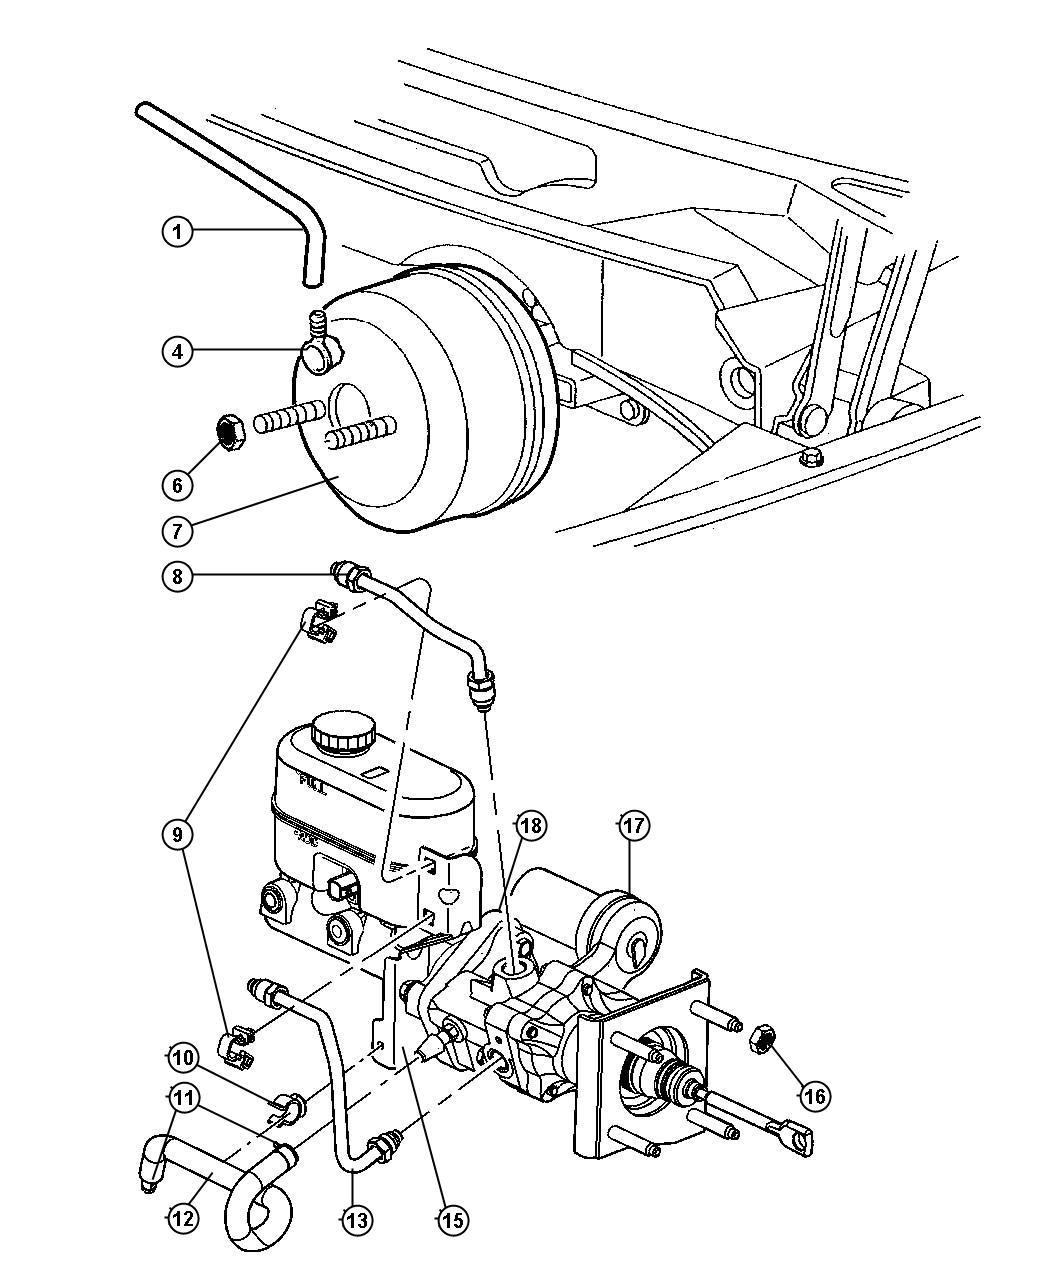 wiring diagram moreover leryn franco on dodge pickup wiring diagram